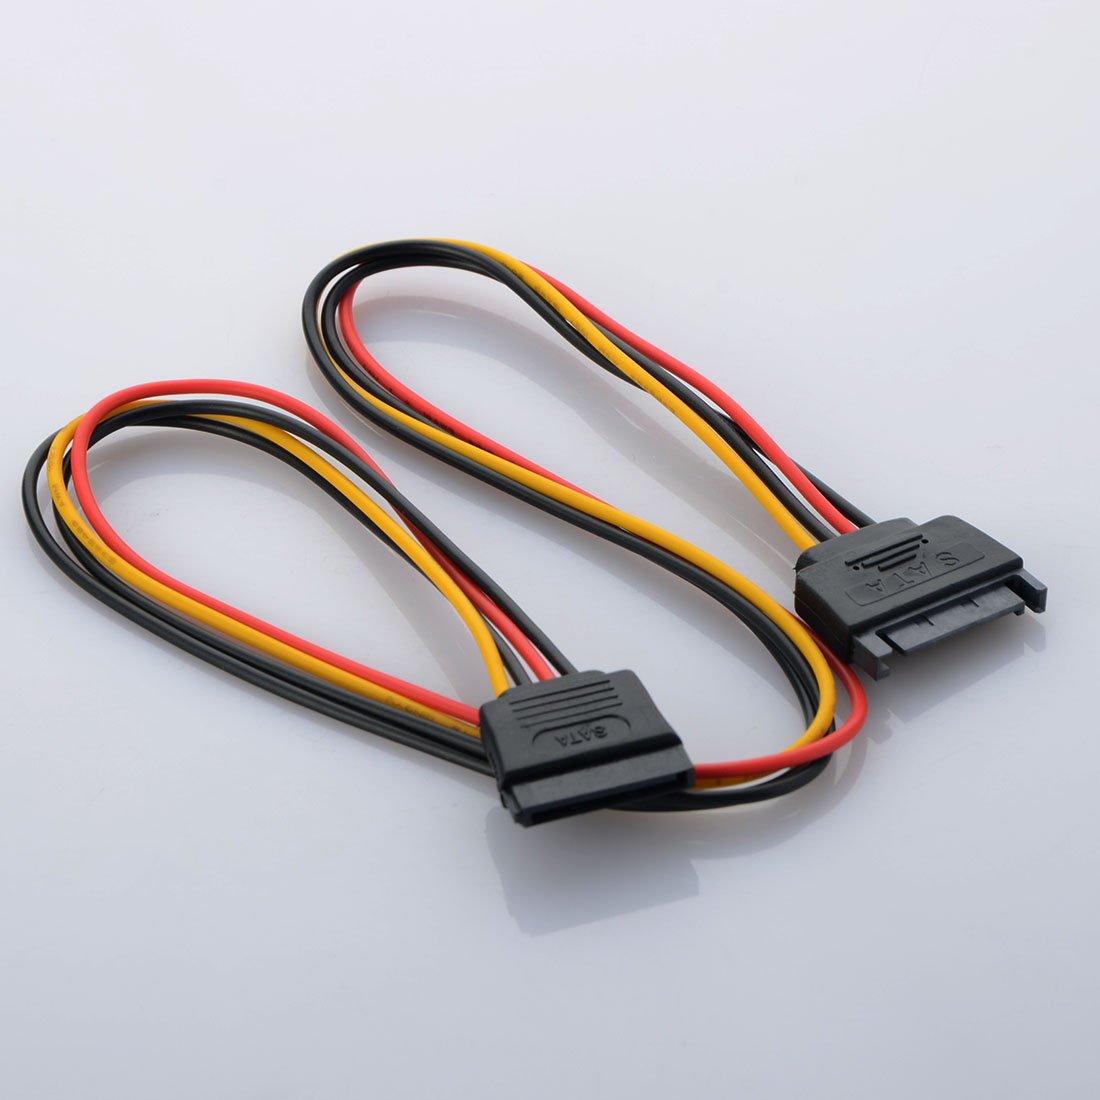 ASDOMO SATA Power Extension Cable,SATA power cord extension cable Serial cable power cord extension cord 15Pin male busbar